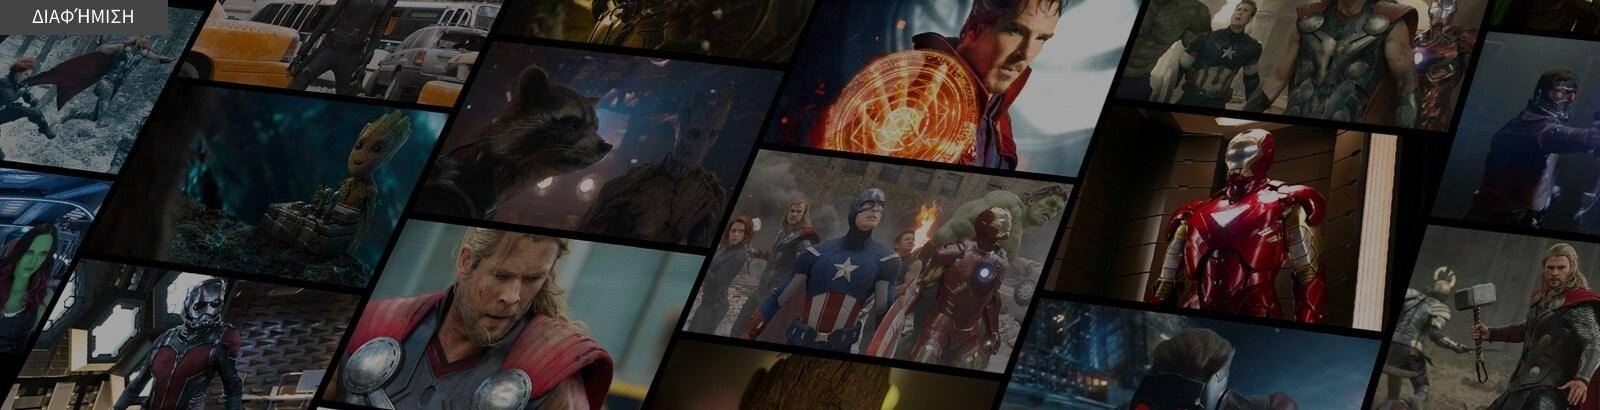 Marvel | Διαθέσιμα για Λήψη & Αποθήκευση